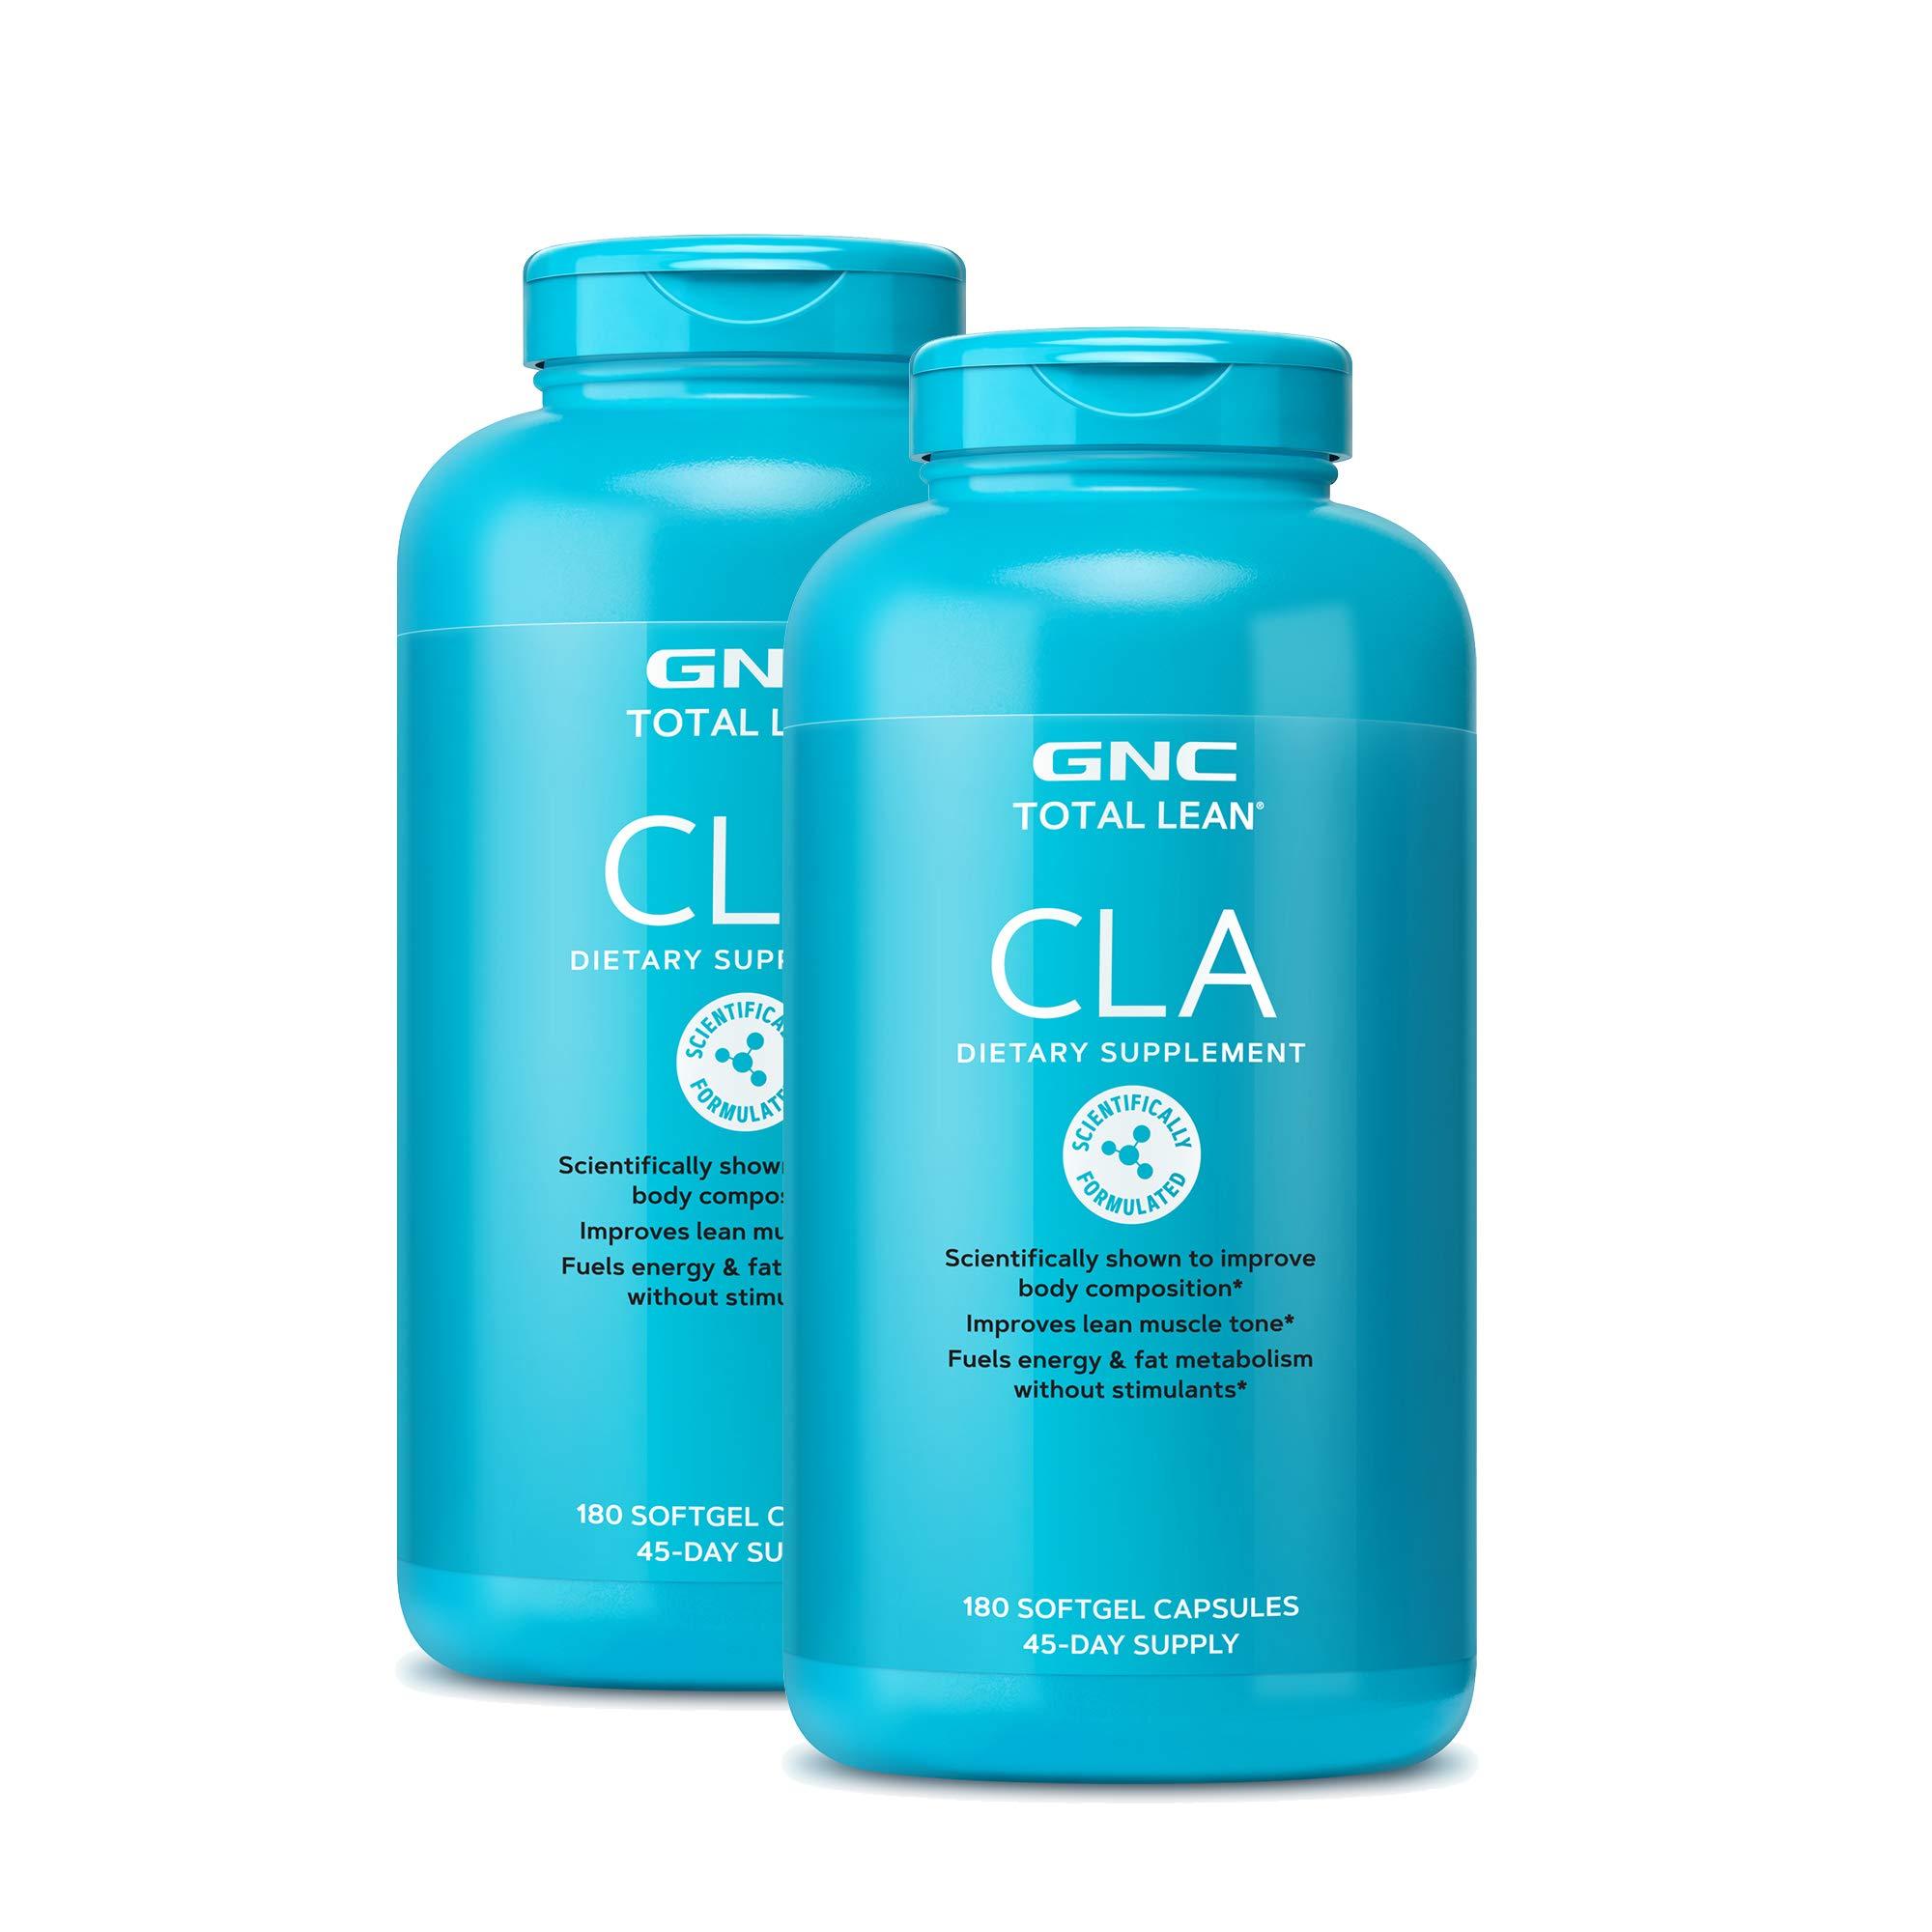 GNC Total Lean CLA - Twin Pack